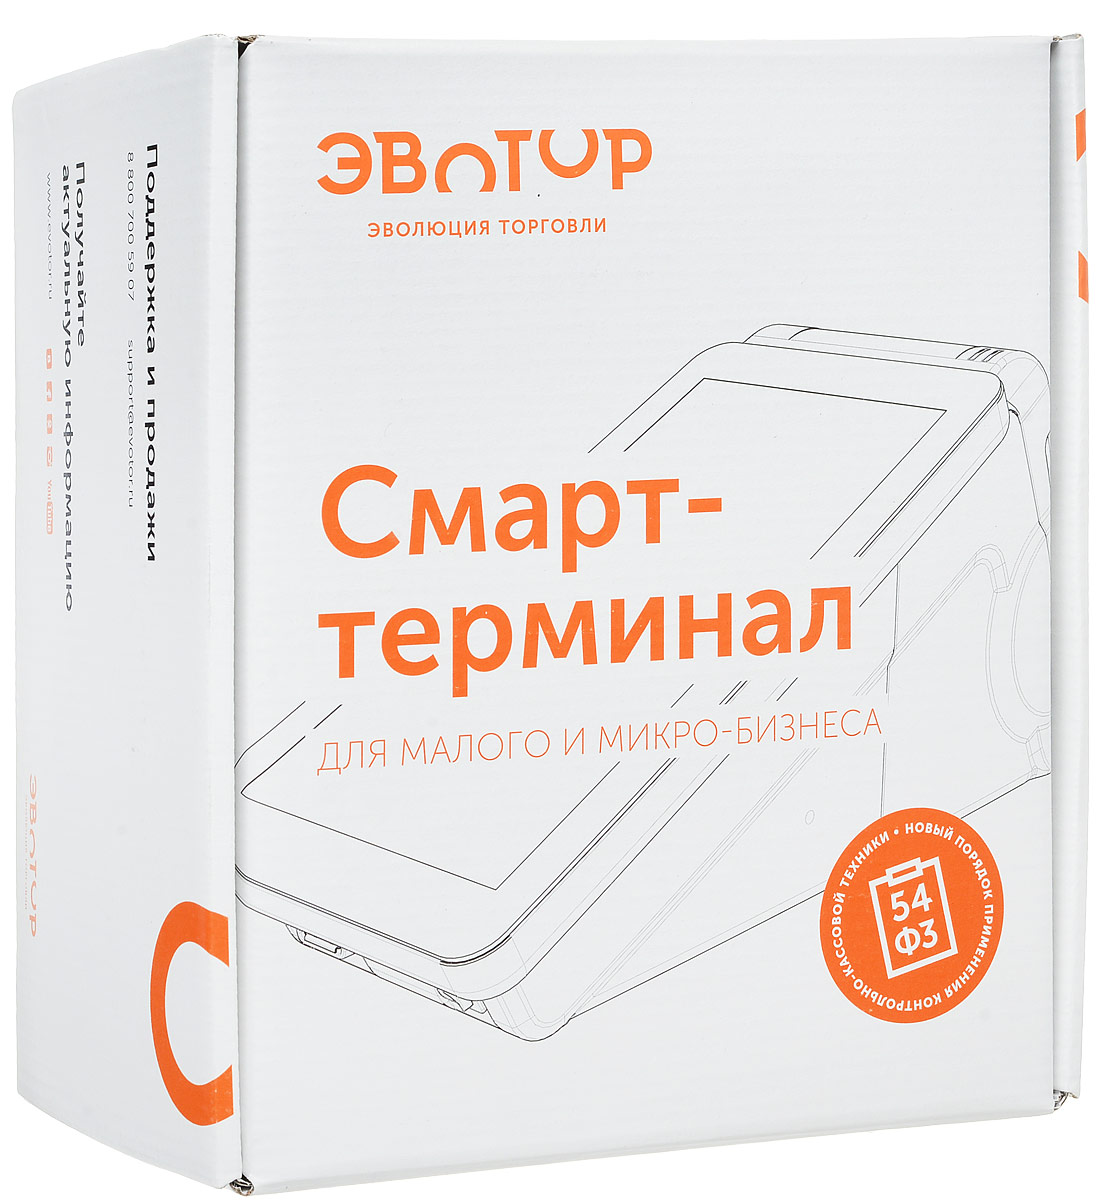 Эвотор Стандарт ФН смарт-терминал Эвотор